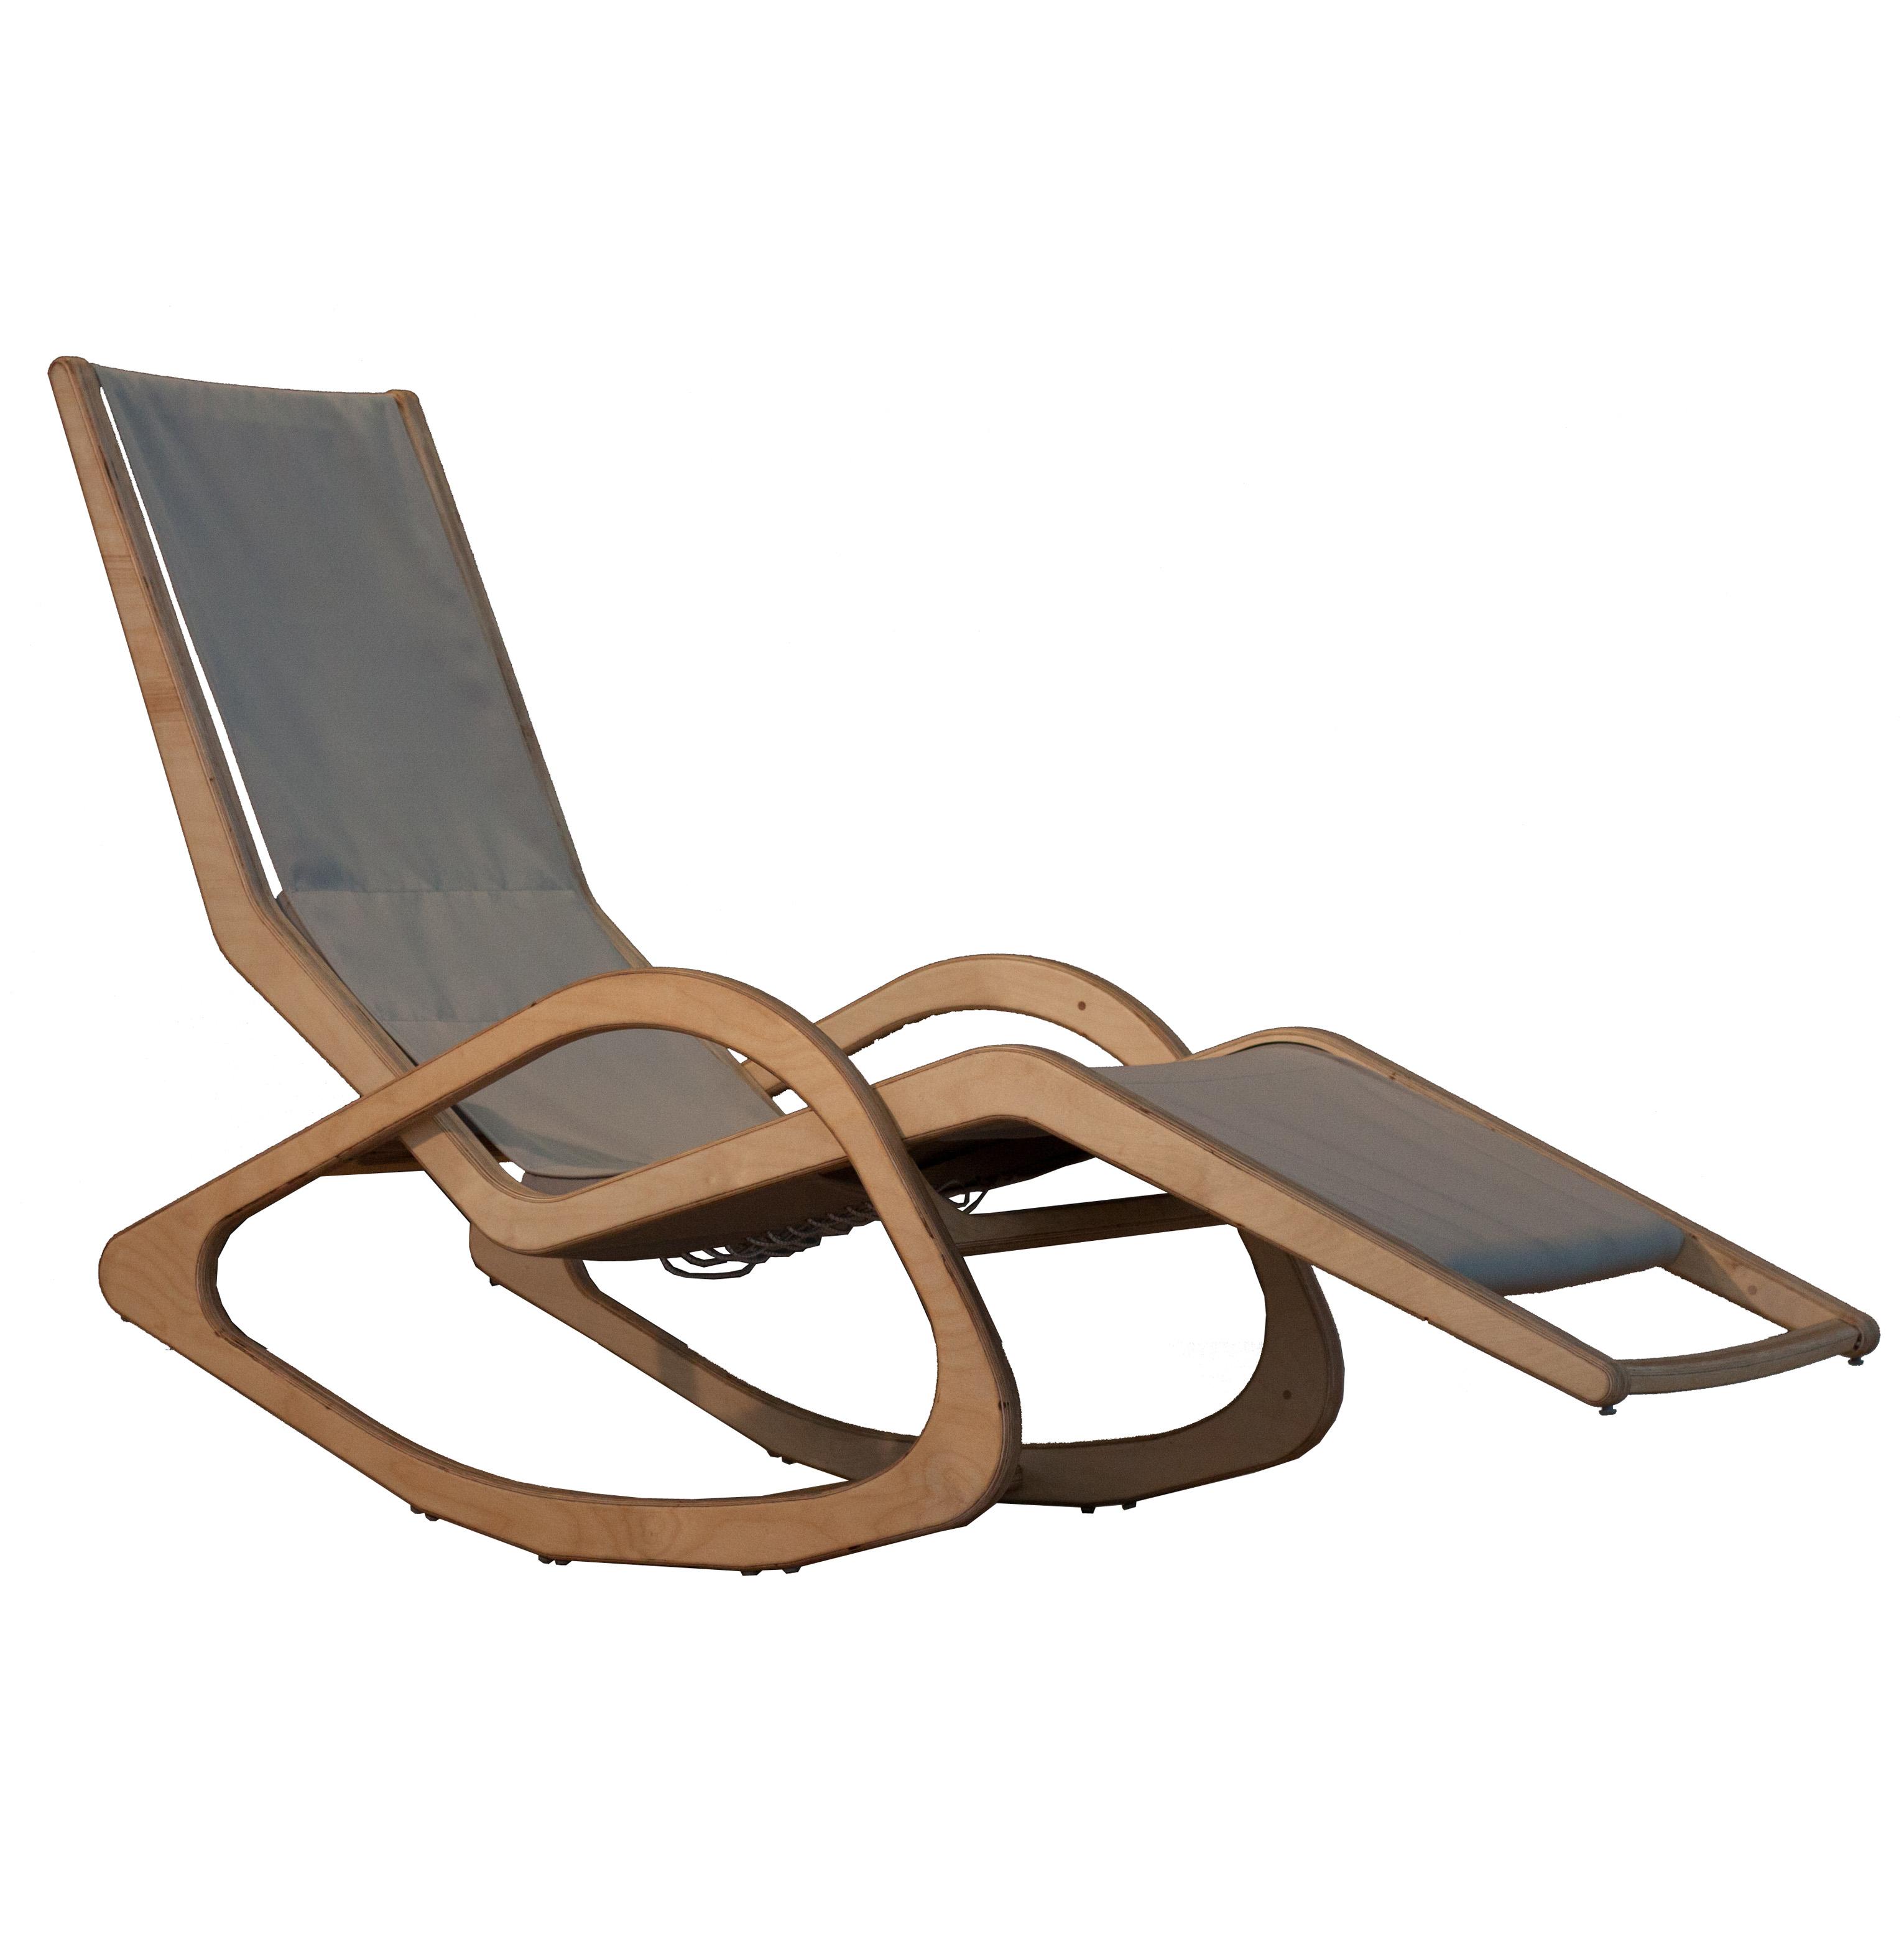 Super Onada Siesta Chair Feather Alphanode Cool Chair Designs And Ideas Alphanodeonline